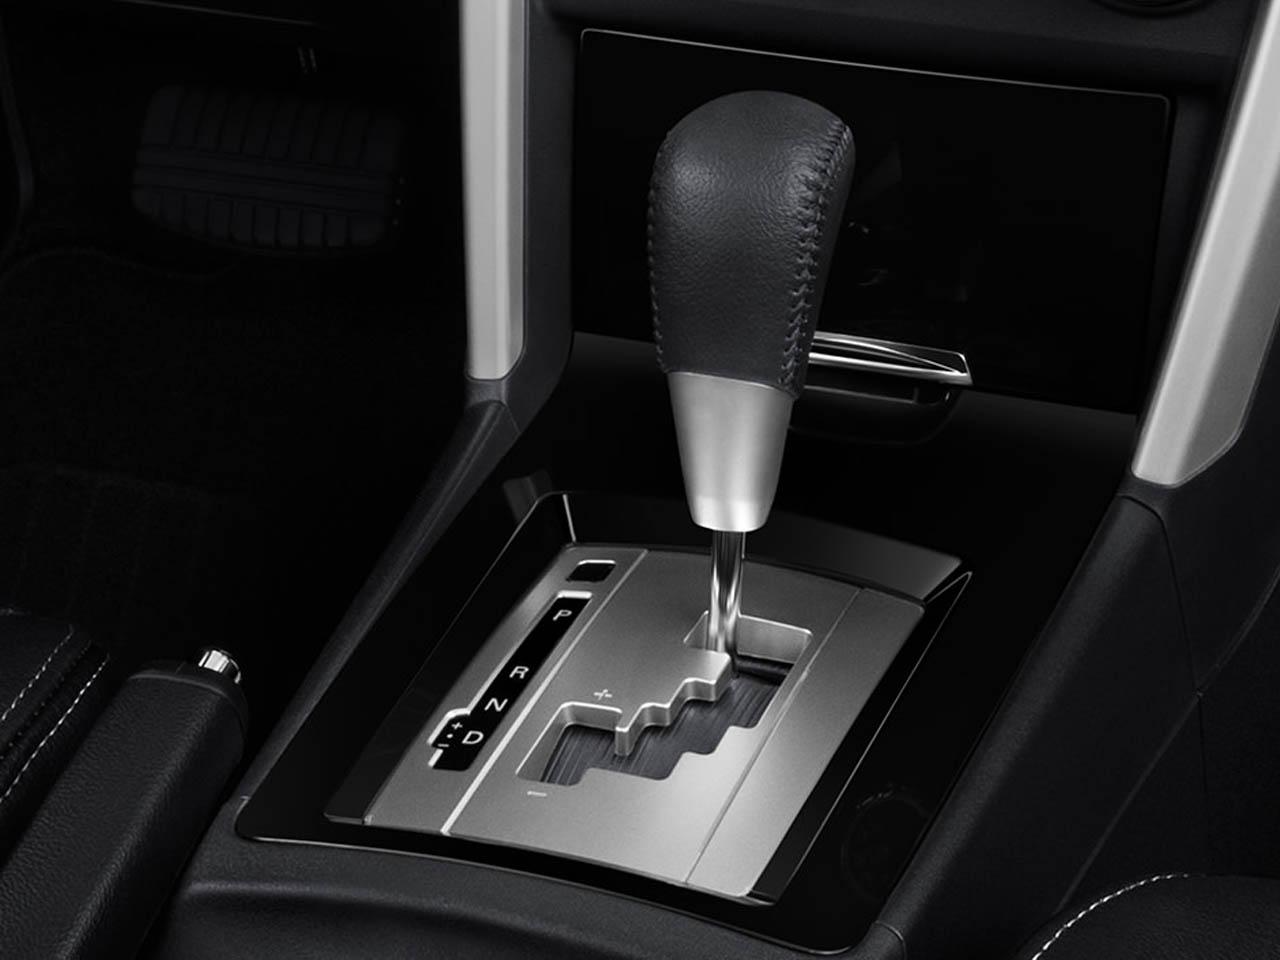 Mitsubishi Lancer Interior نمای داخلی میتسوبیشی لنسر